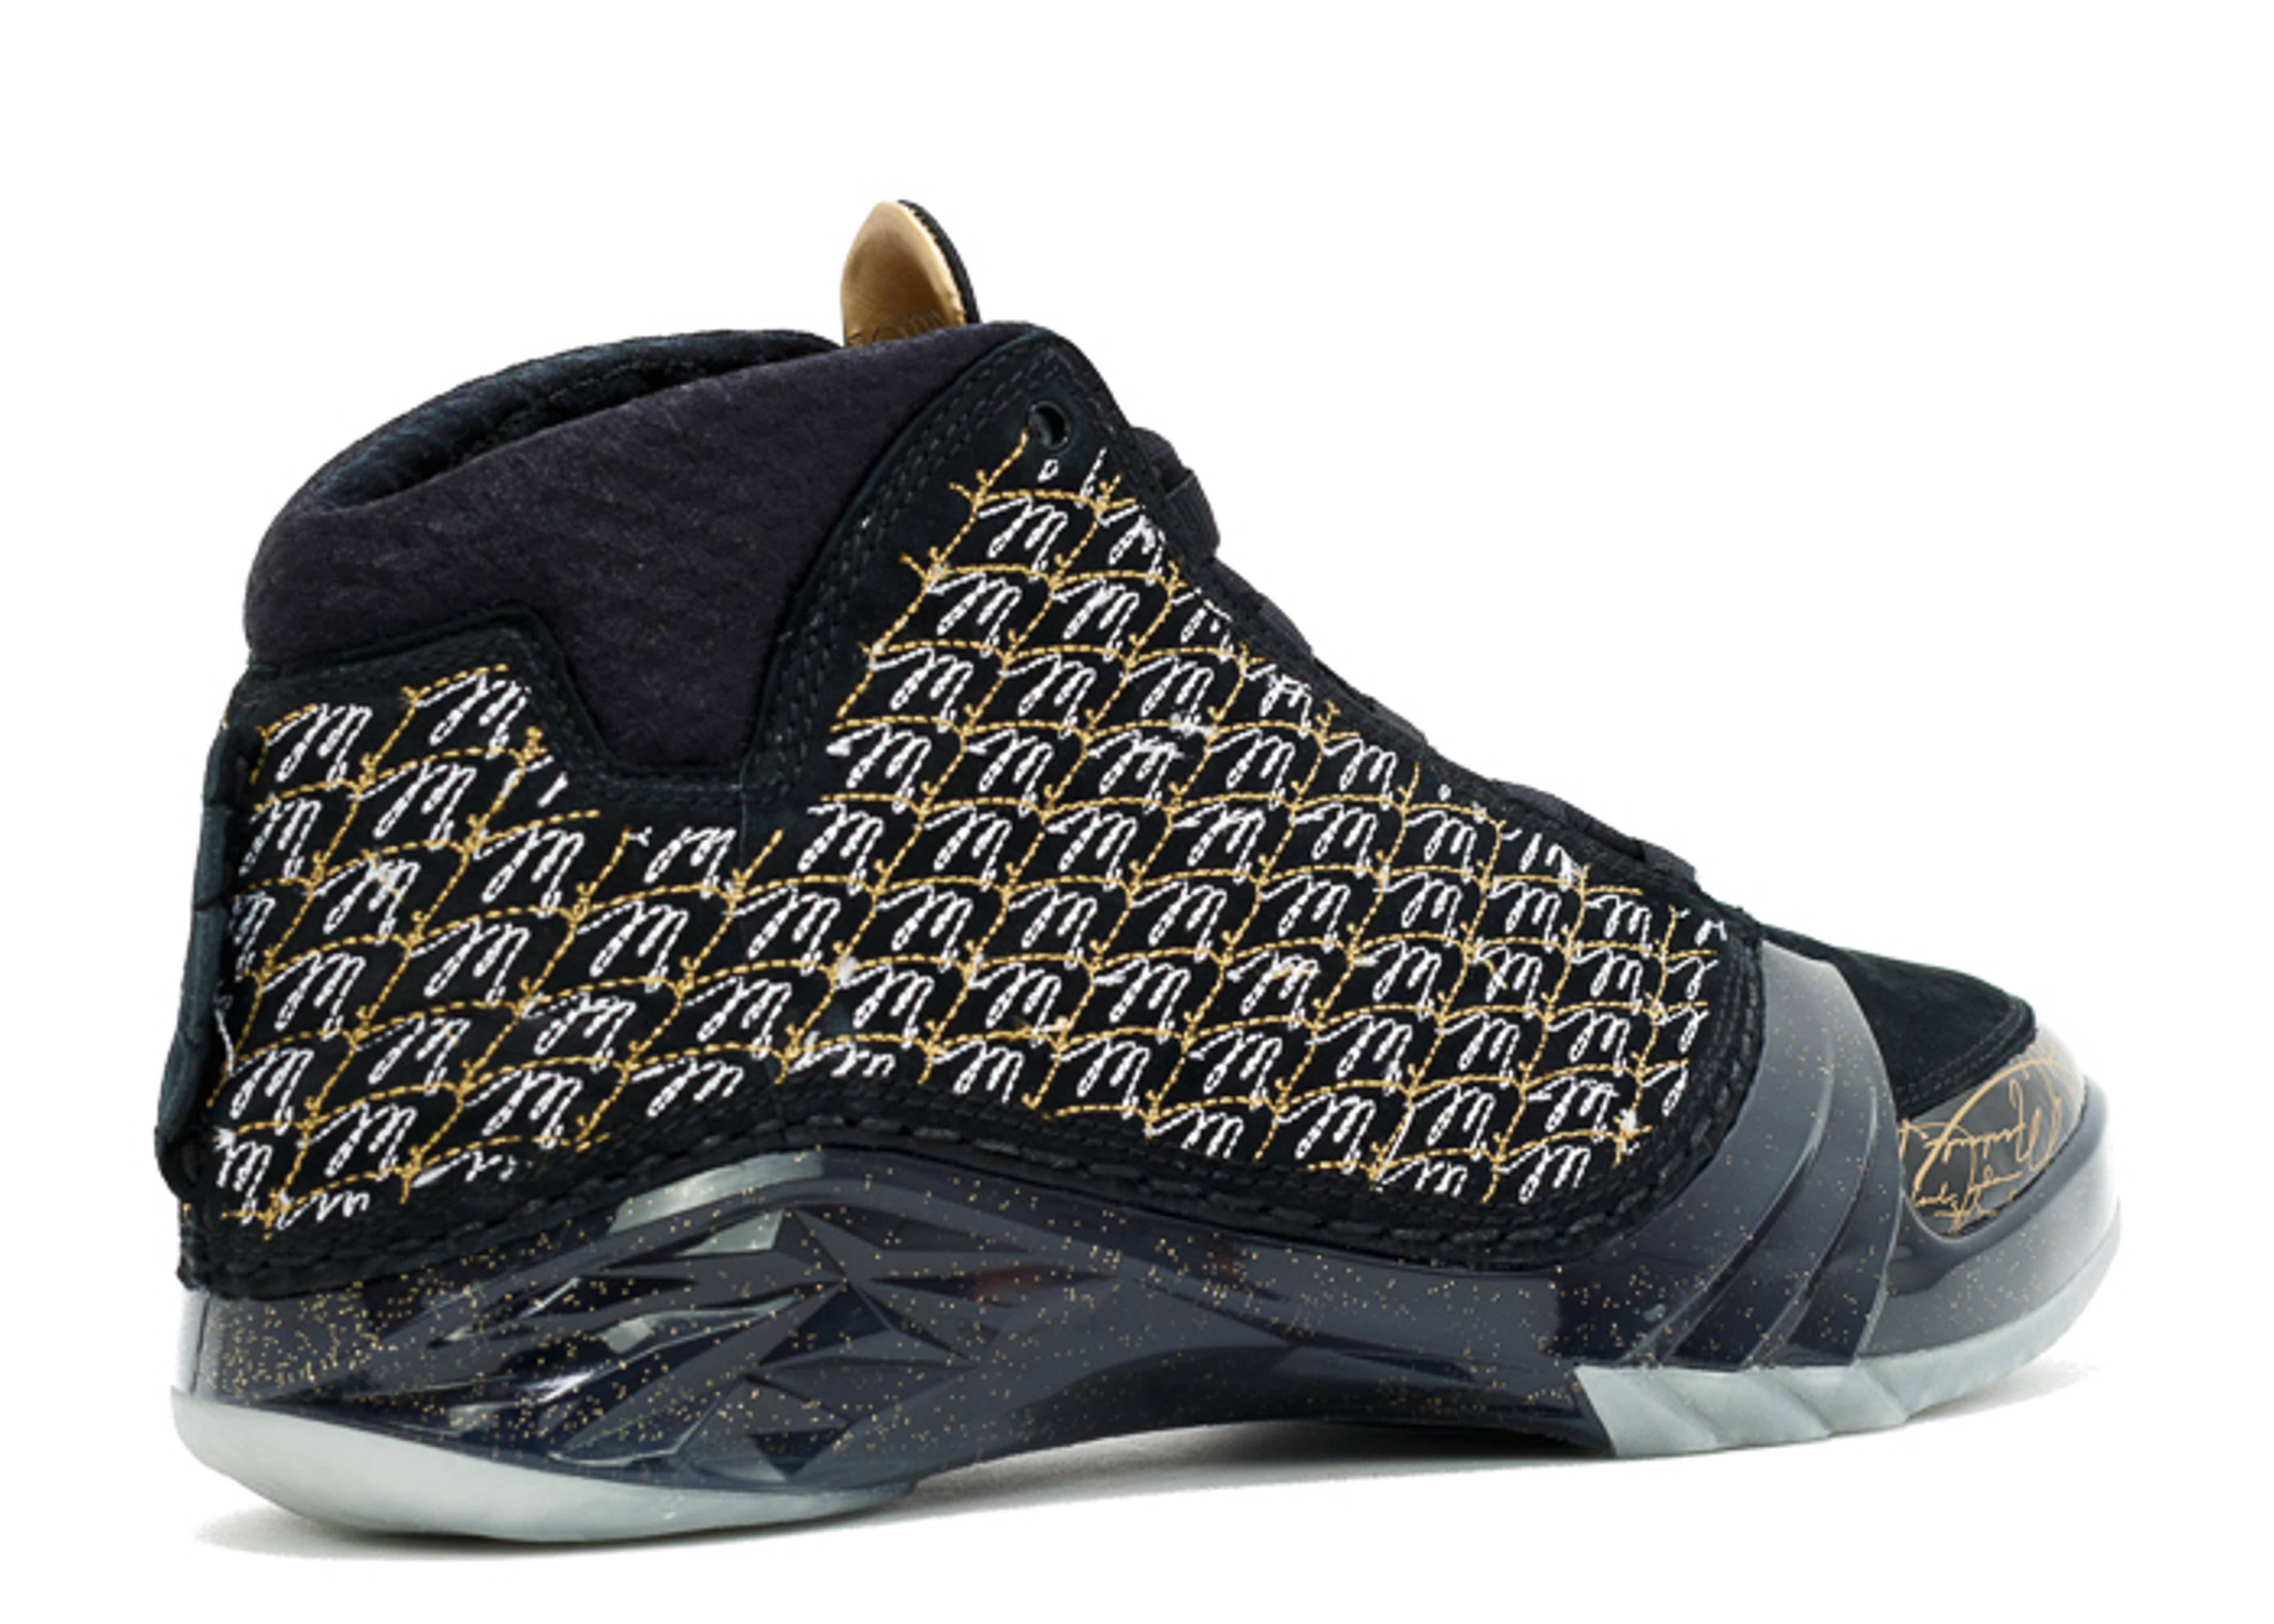 a086c2b06e3 Air Jordan 23 Trophy Room - Air Jordan - 853336 023 - black black-metallic  gold-dark grey